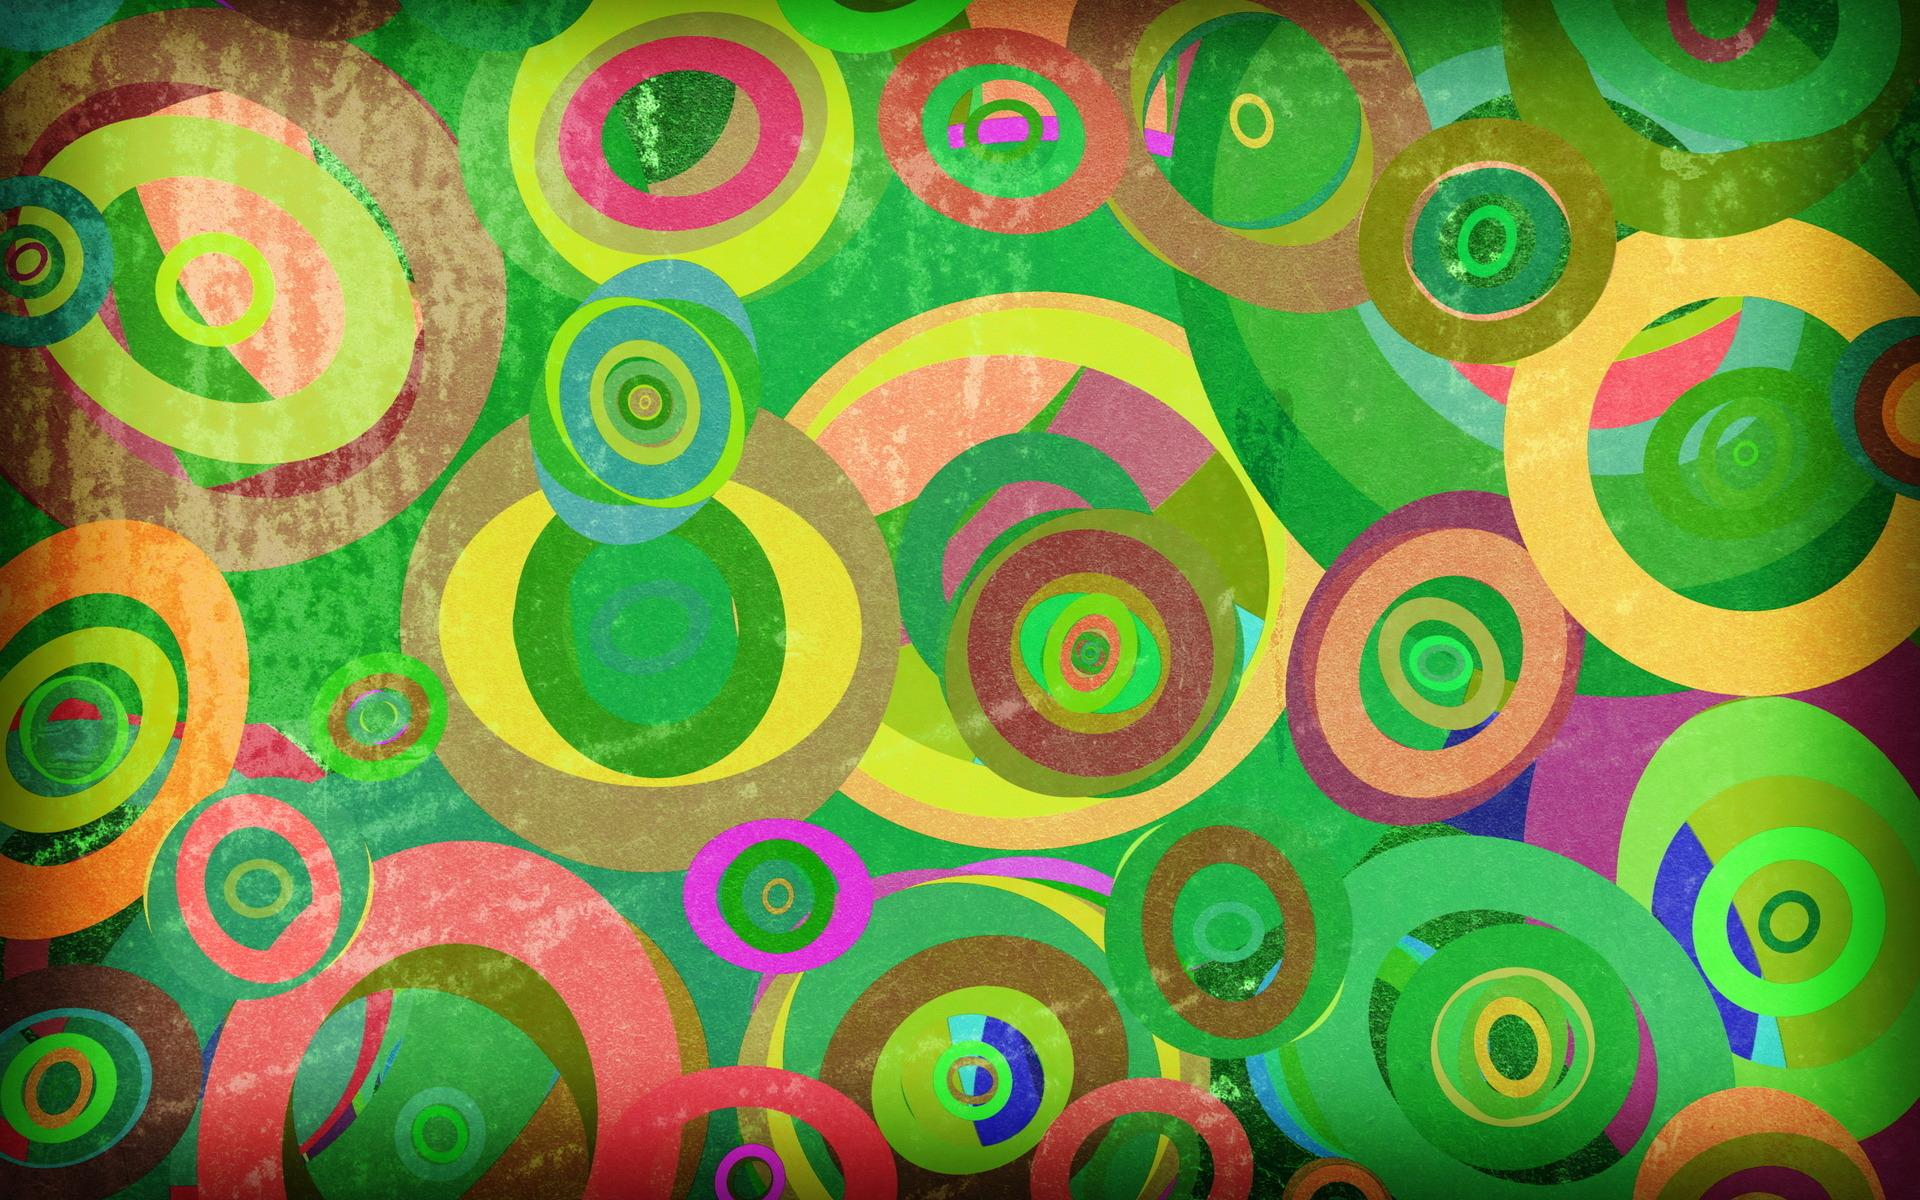 Цвета, краски, узоры, текстуры обои для ...: hq-wallpapers.ru/wallpapers/abstraction3d/pic52346_raz1920x1200